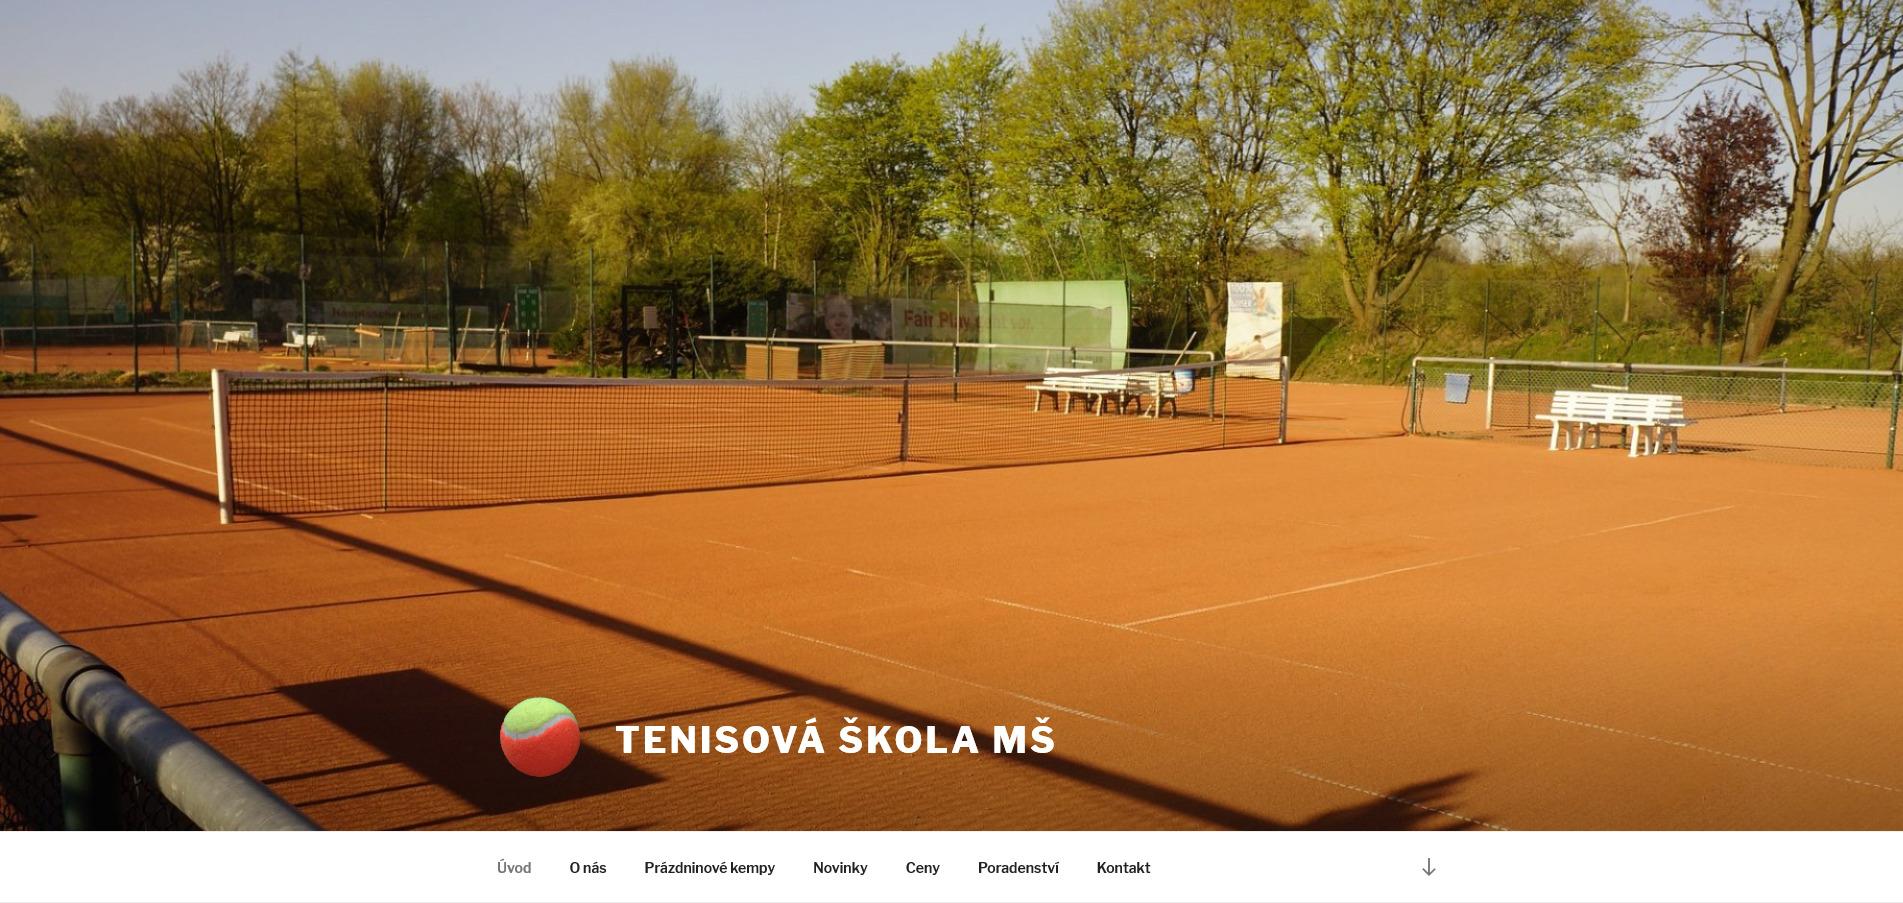 Tenisová škola MŠ